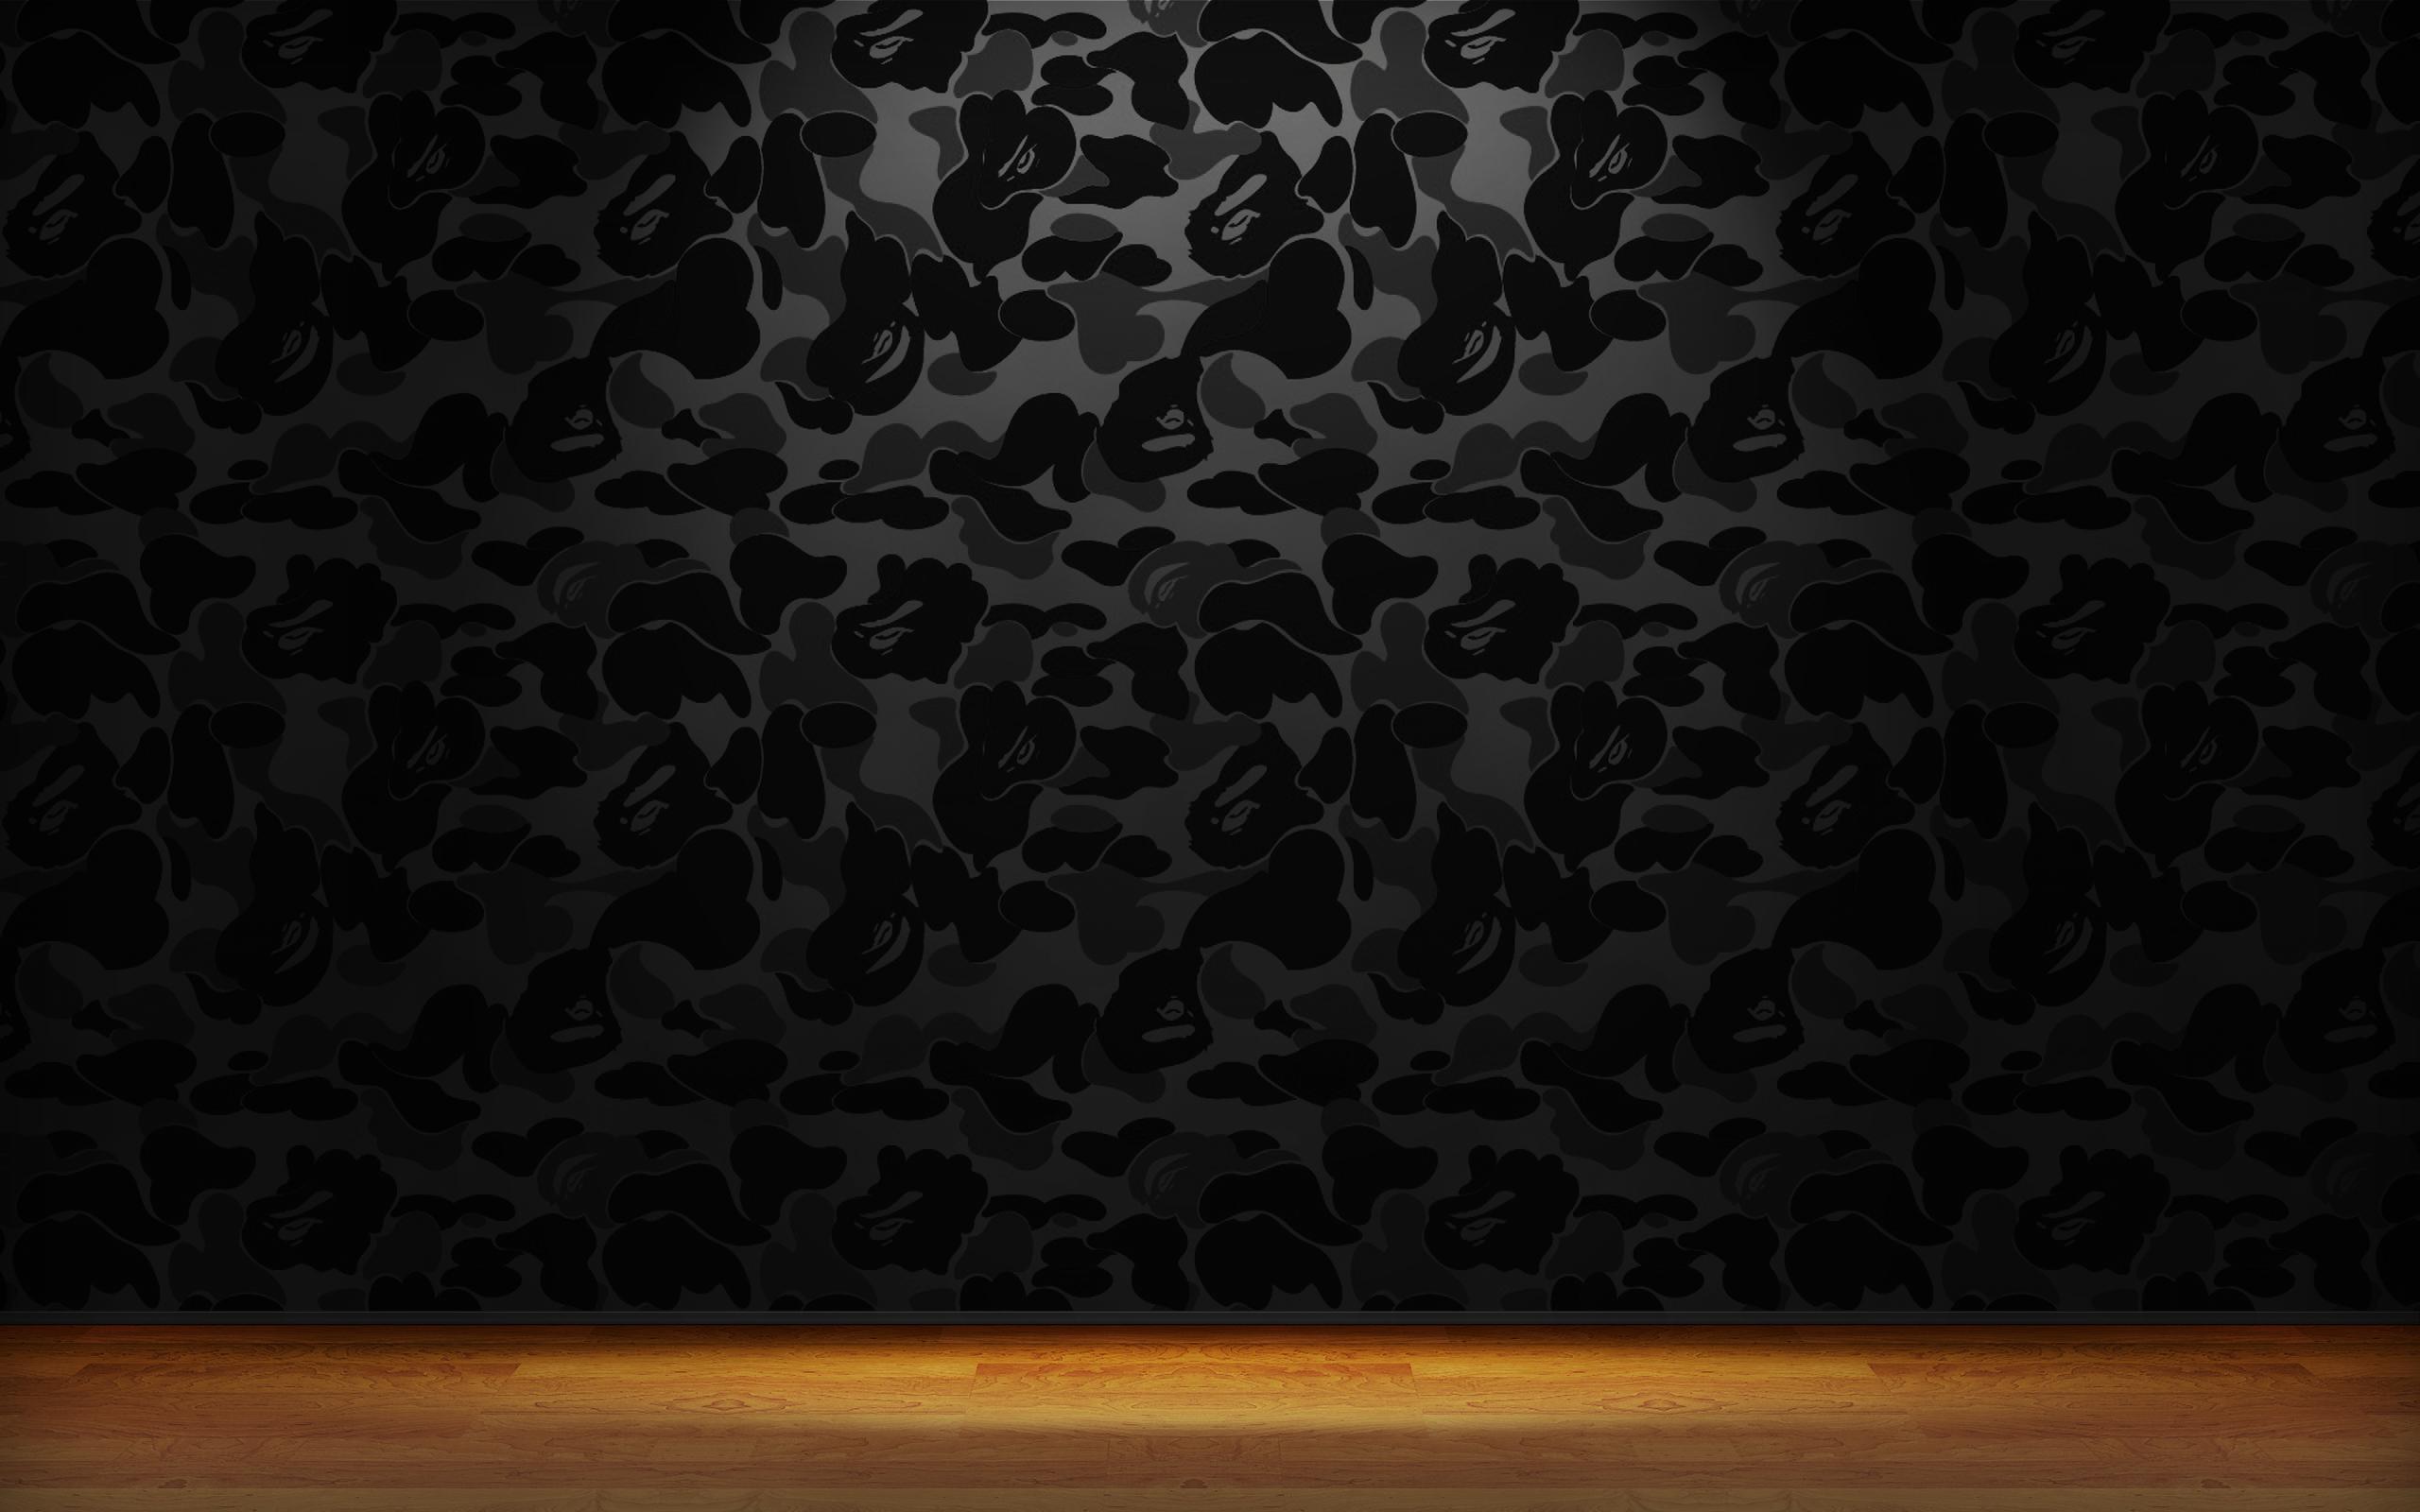 Bape Wallpaper Bape unbricked by 2560x1600